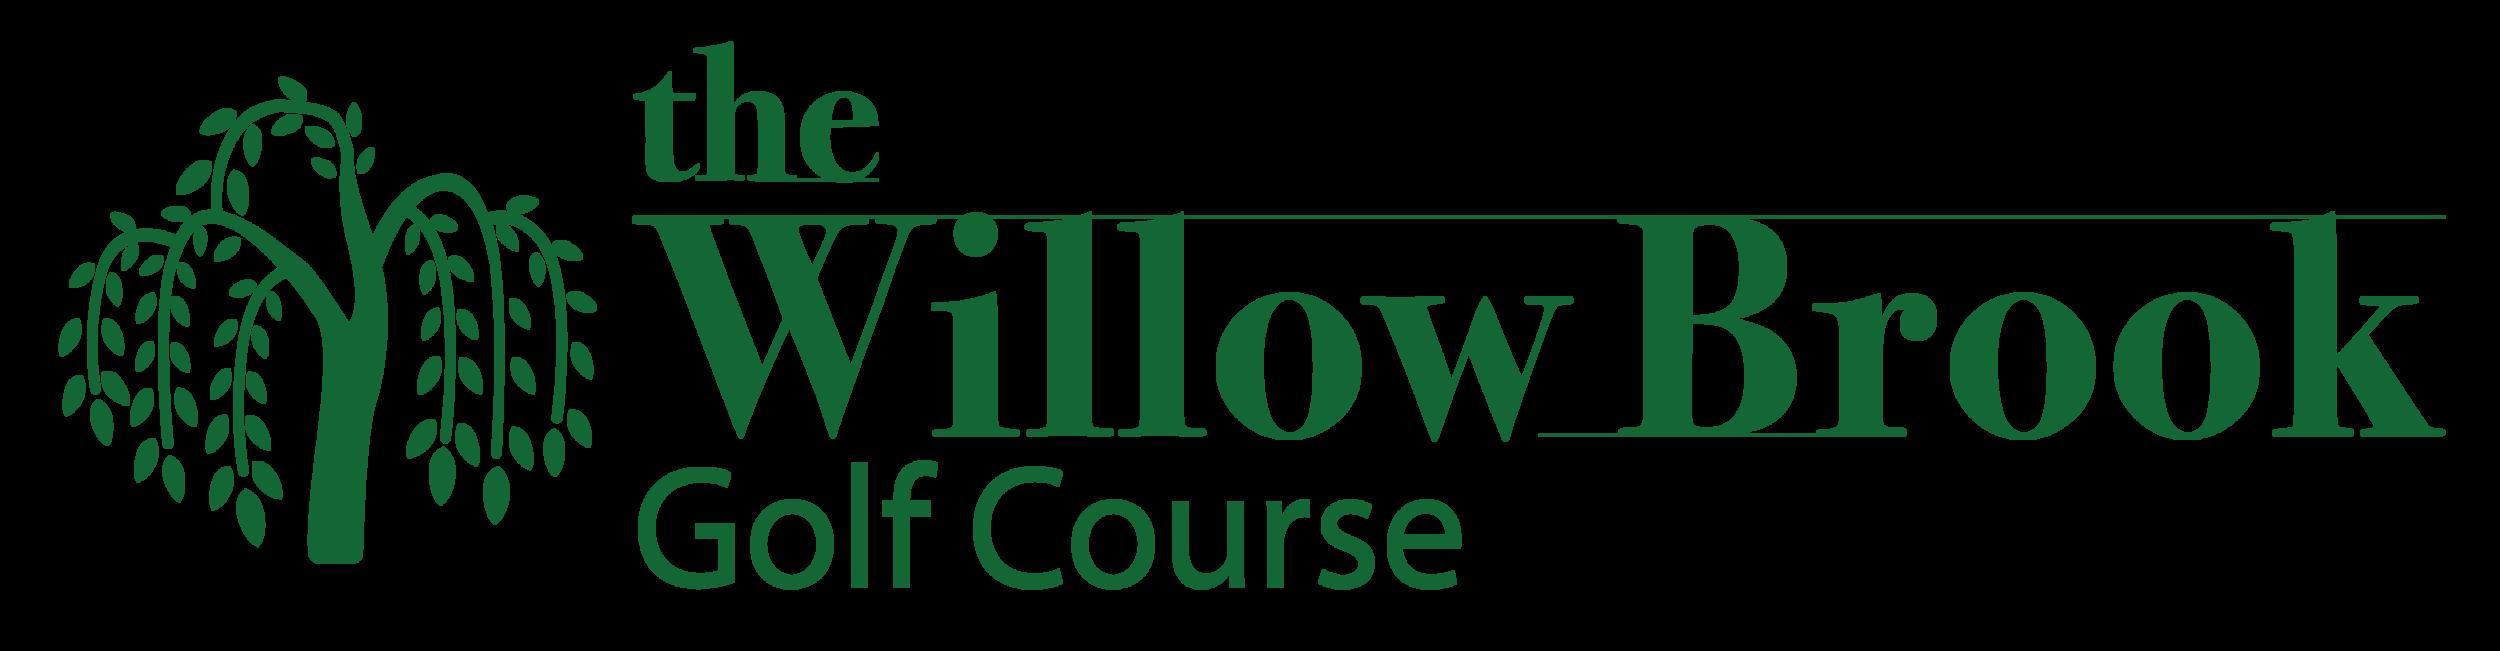 Willow Brook_Golf Club Logo.png